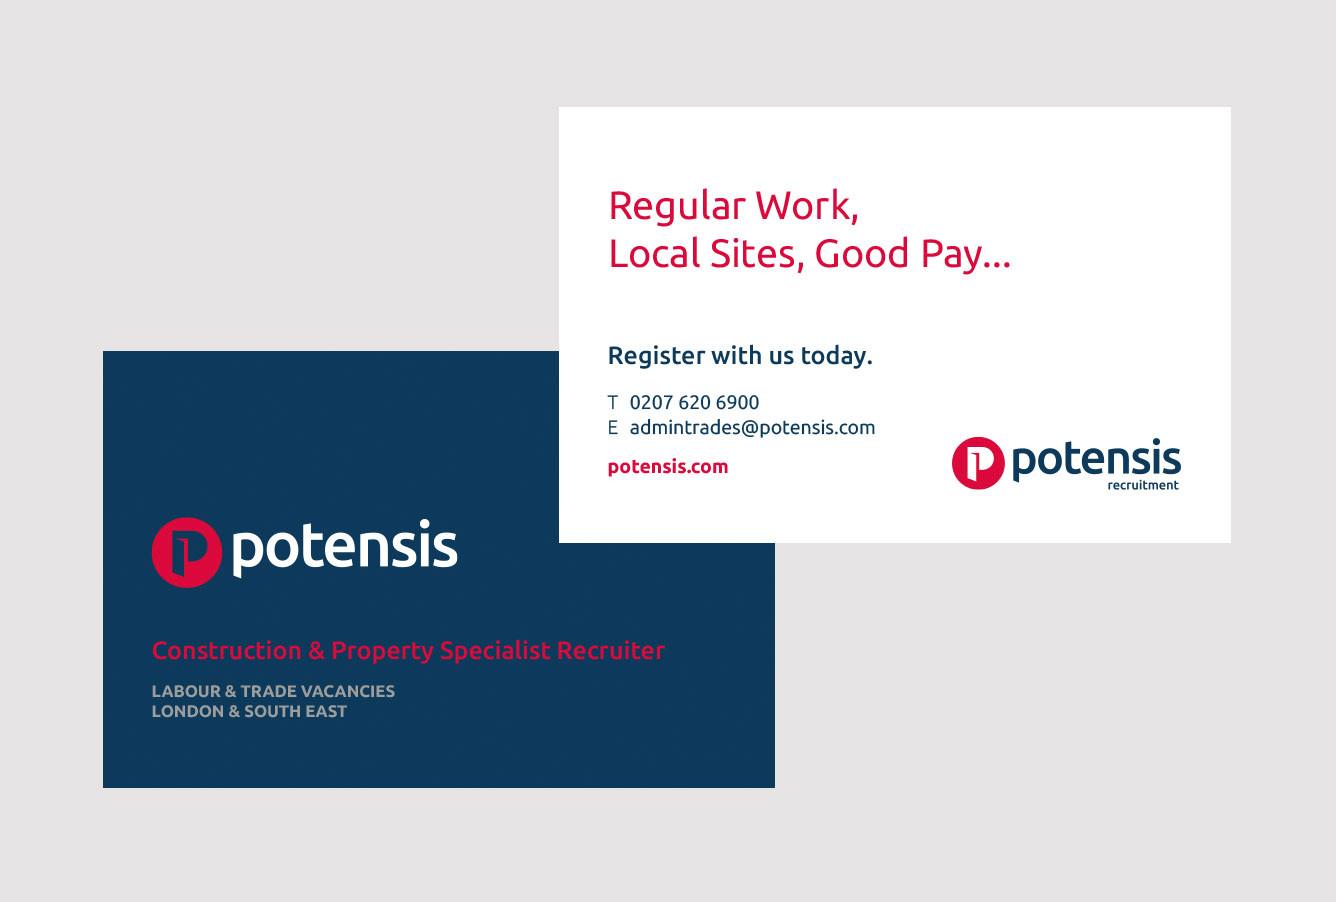 Potensis Recruitment